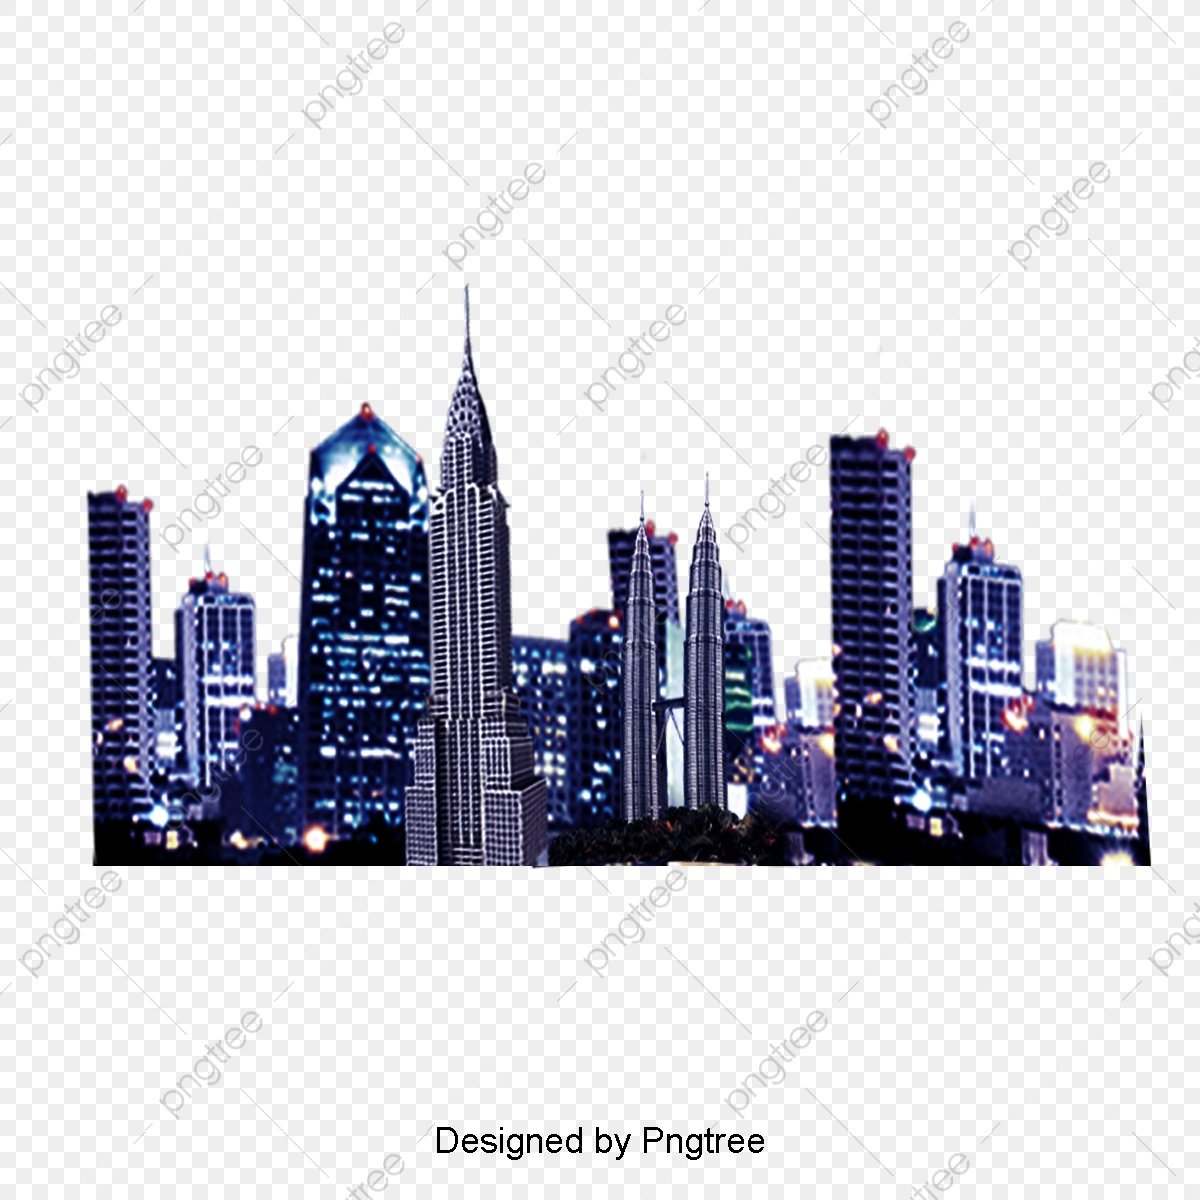 Night City Background, Night Cityscape, City Night Background PNG.